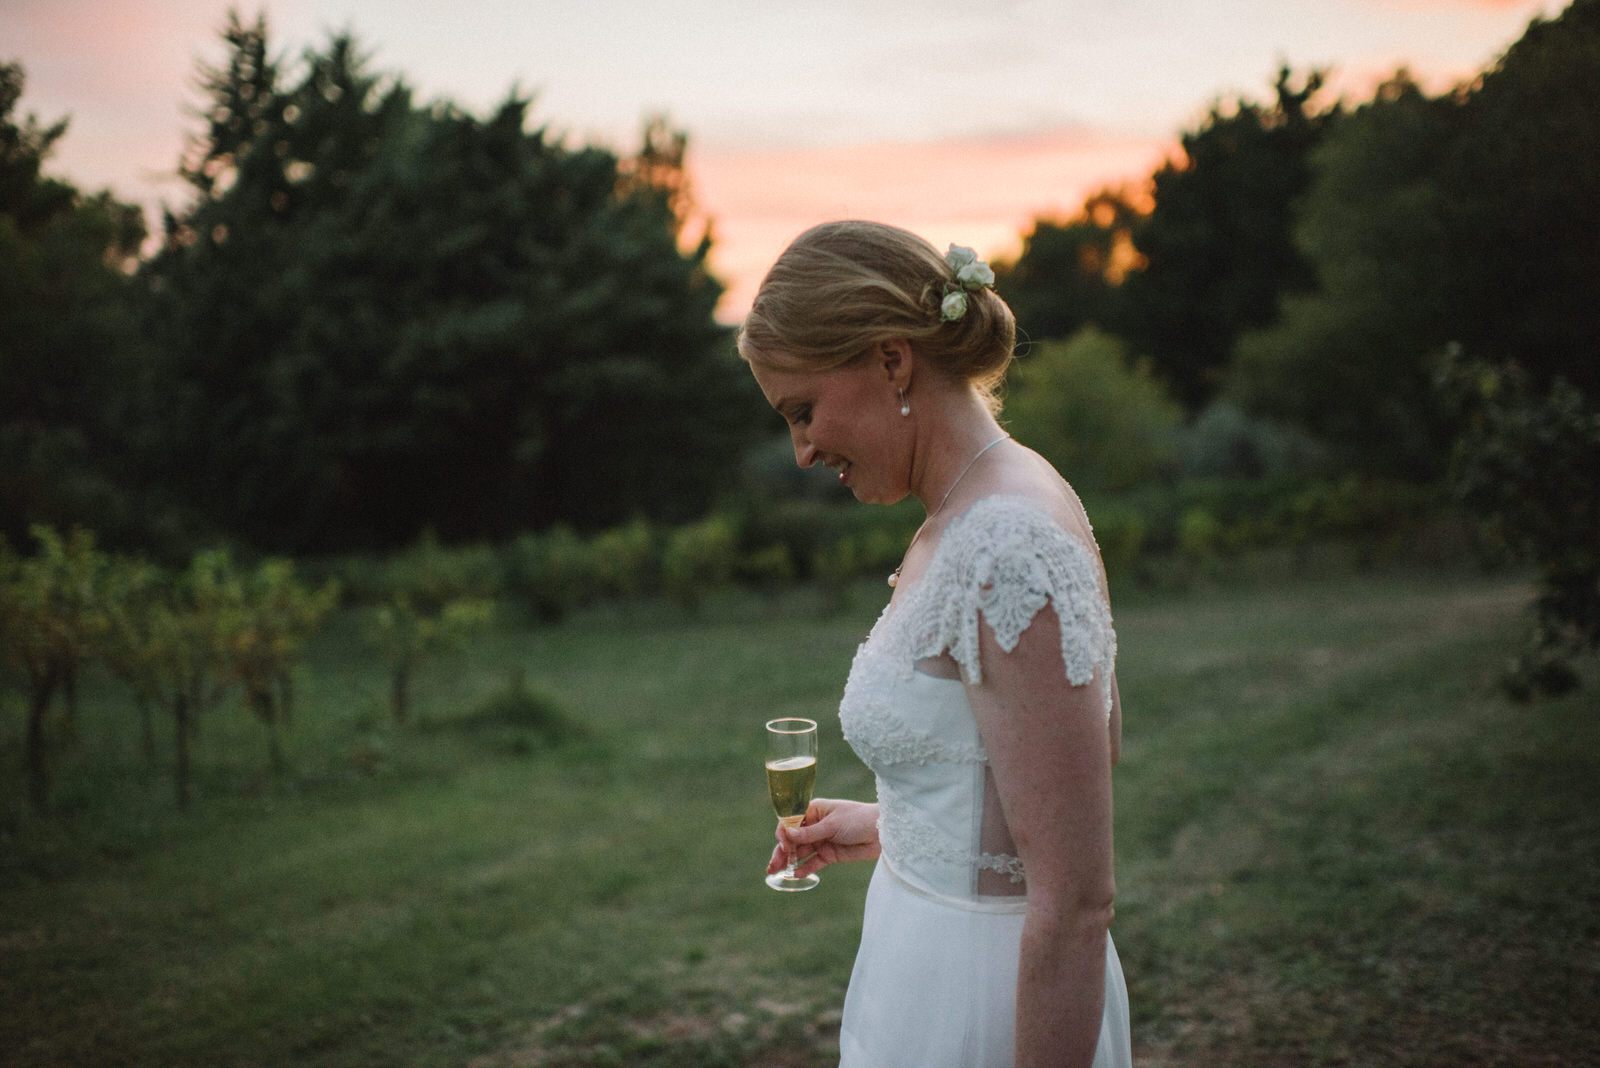 034-LOURMARIN-WEDDING-PHOTOGRAPHER-PROVENCE-WEDDING-ALTERNATIVE-WEDDING-PHOTOGRAPHY-FRANCE-PROVENCE-GARDEN-WEDDING.JPG